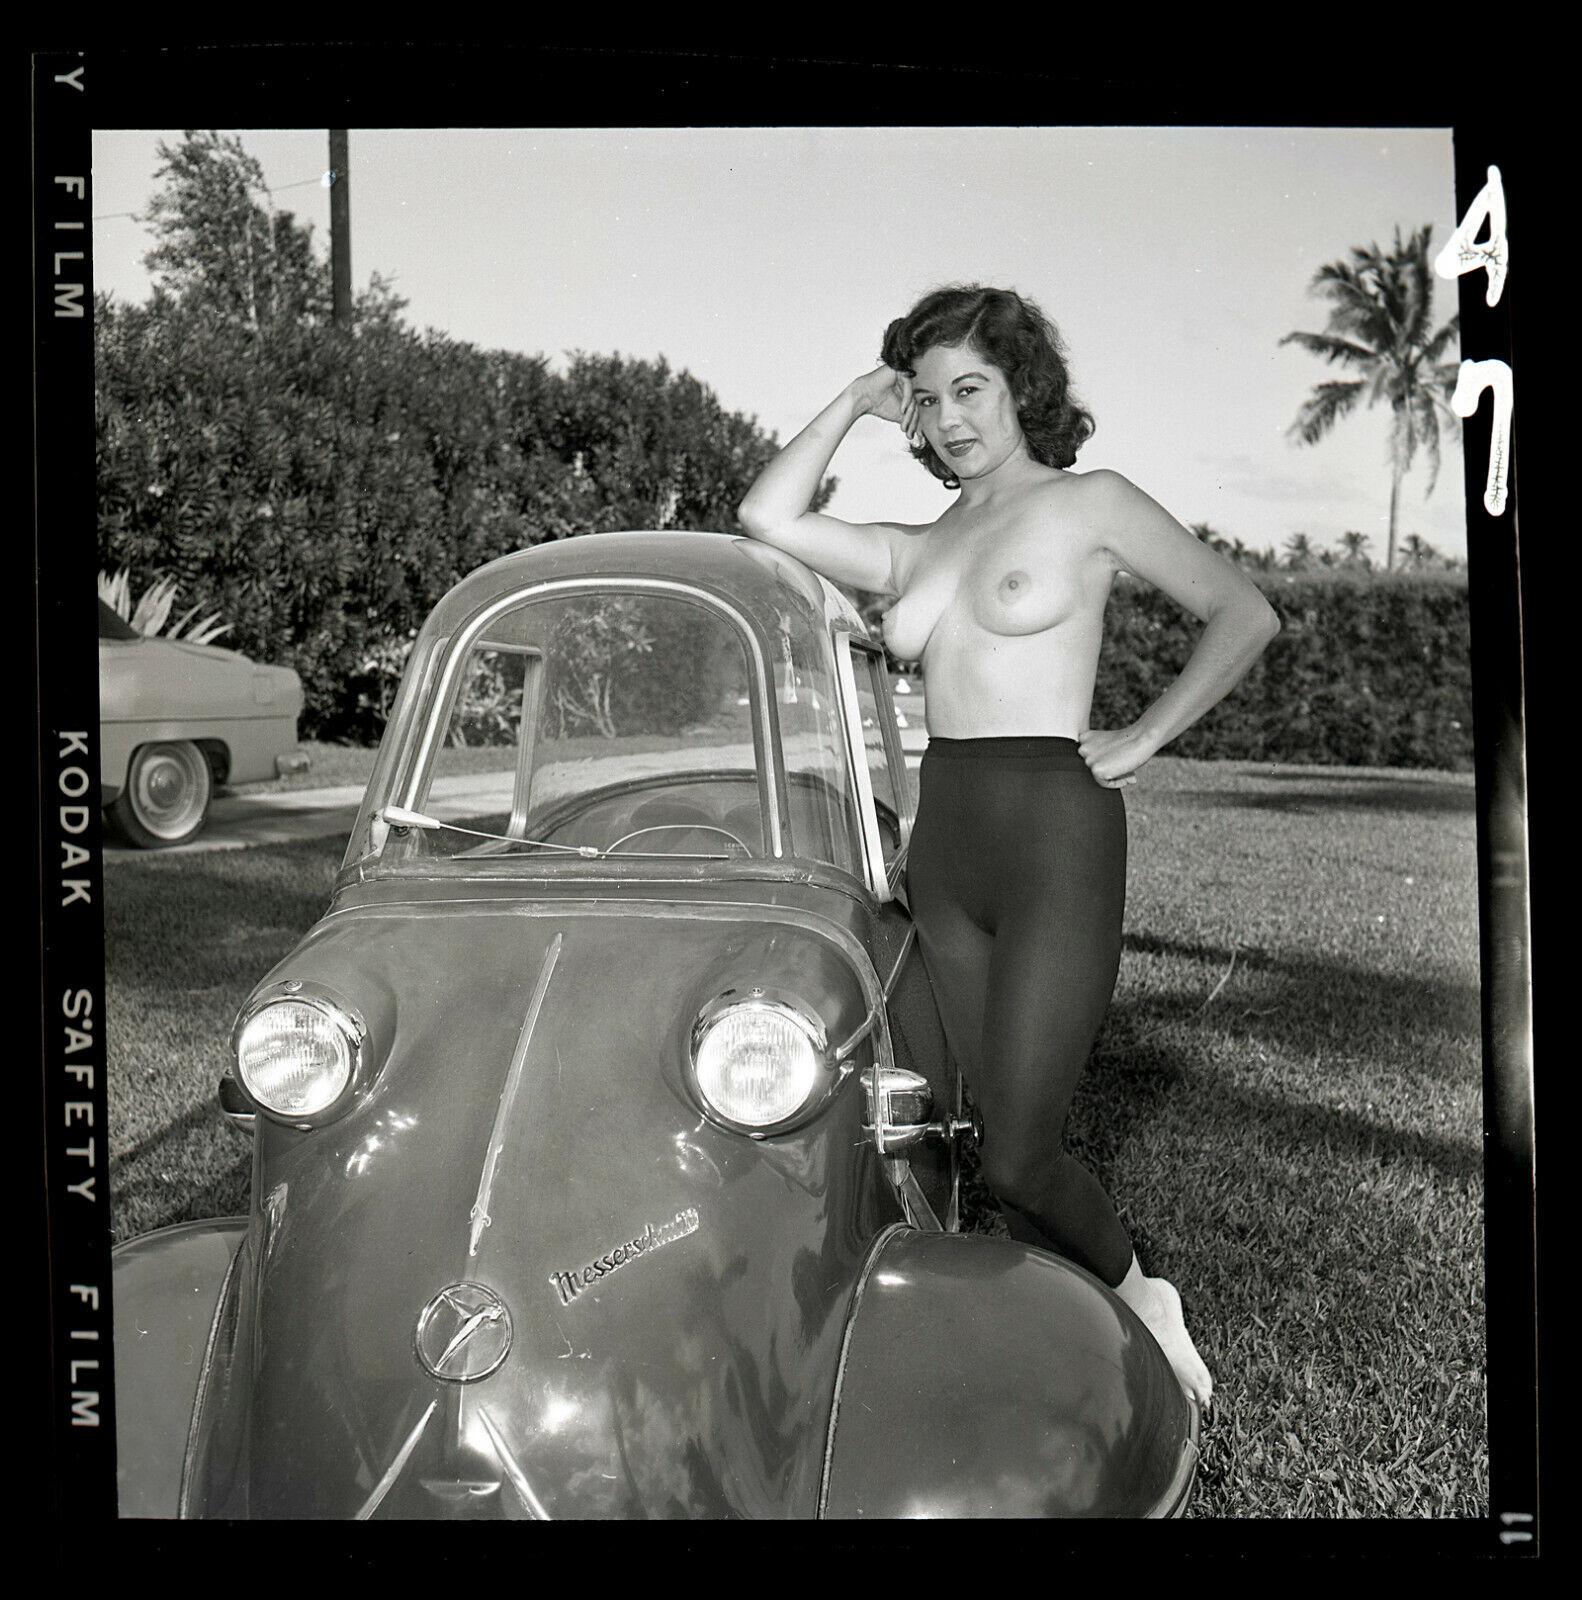 DEBBIE NORRIS 1950s Nude Model Bunny Yeager Archive Orig 2 1/4 Camera Negative - $118.50